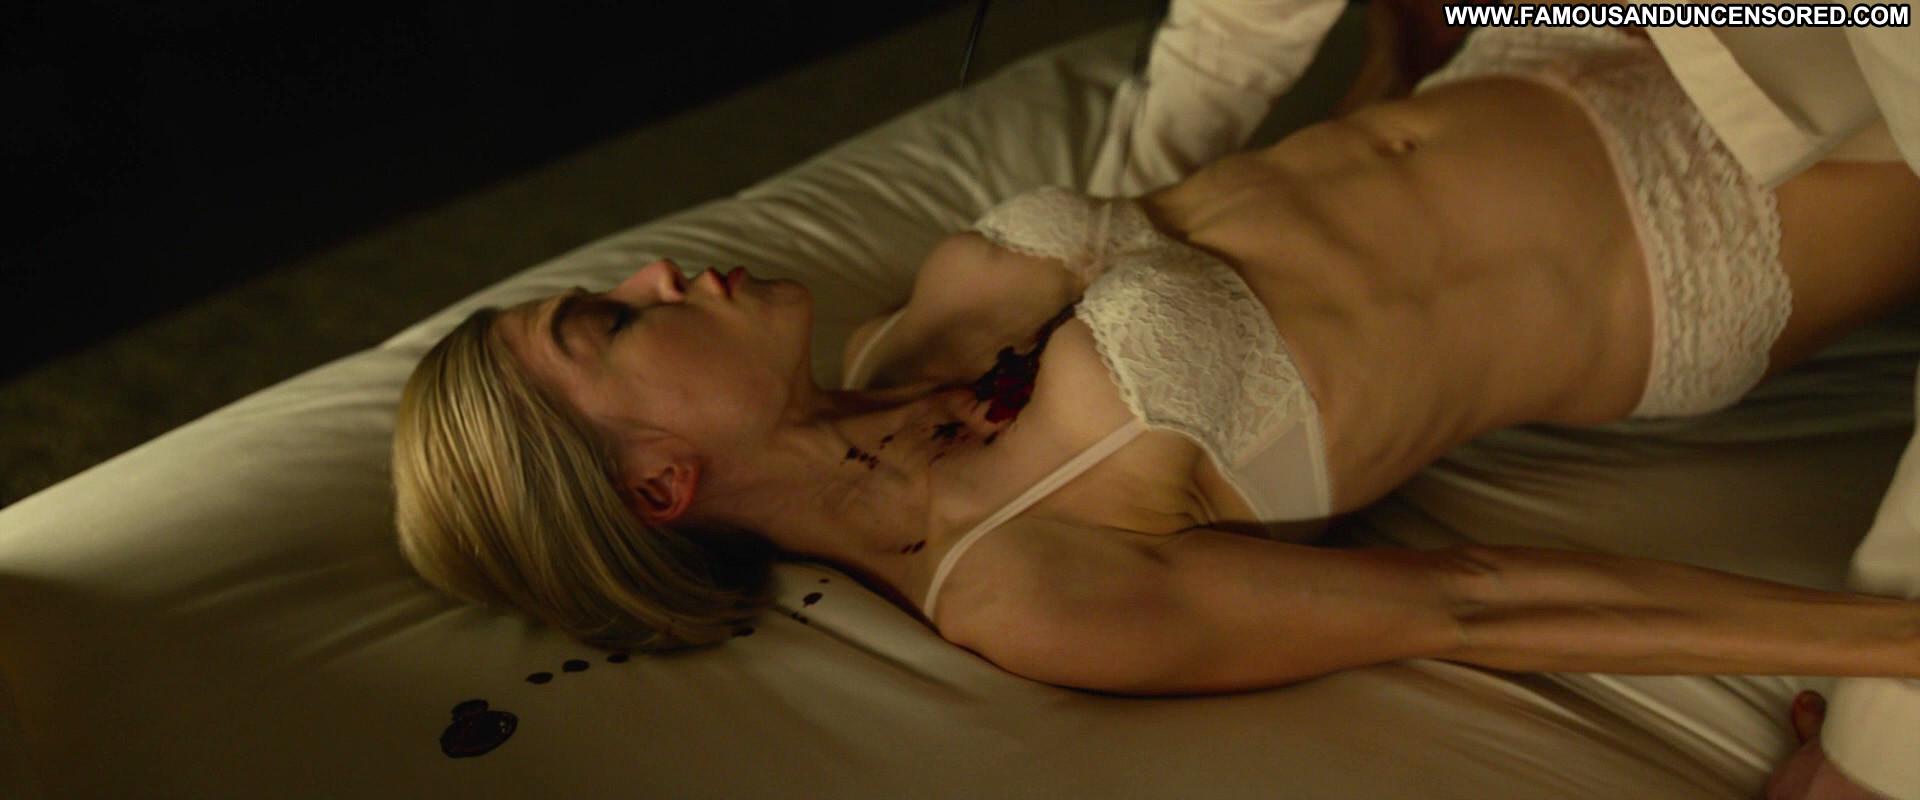 Rosamund Pike Gone Girl Celebrity Posing Hot Beautiful -6084